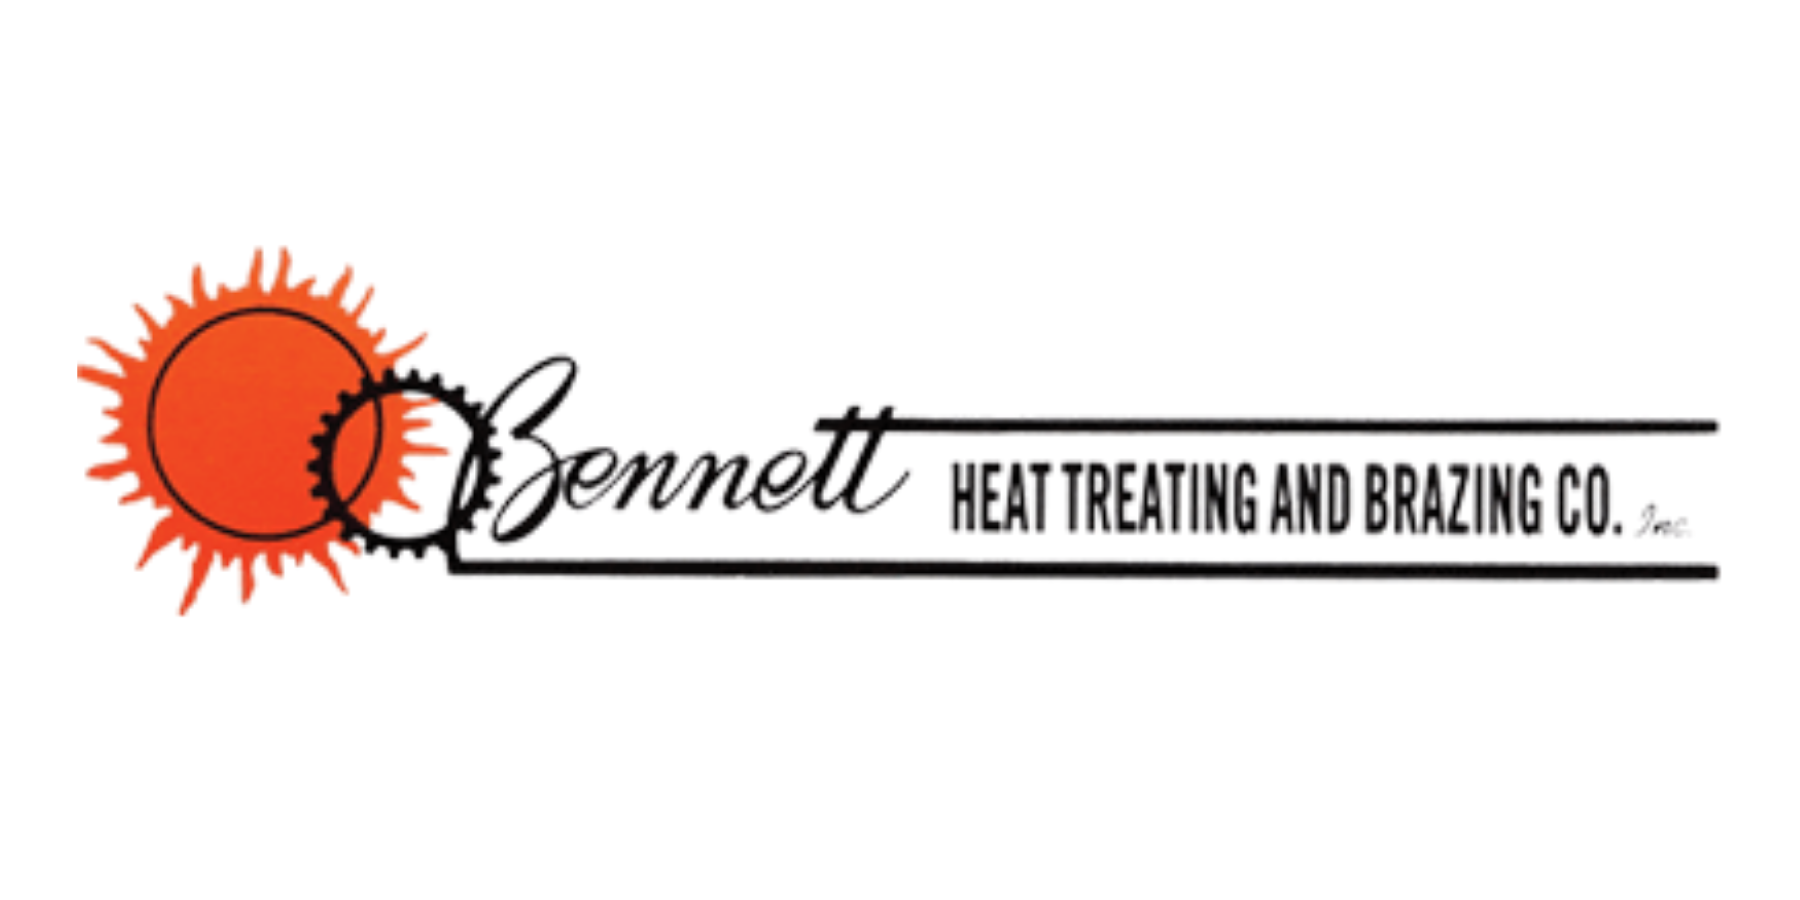 Bennett Heat Treating & Brazing